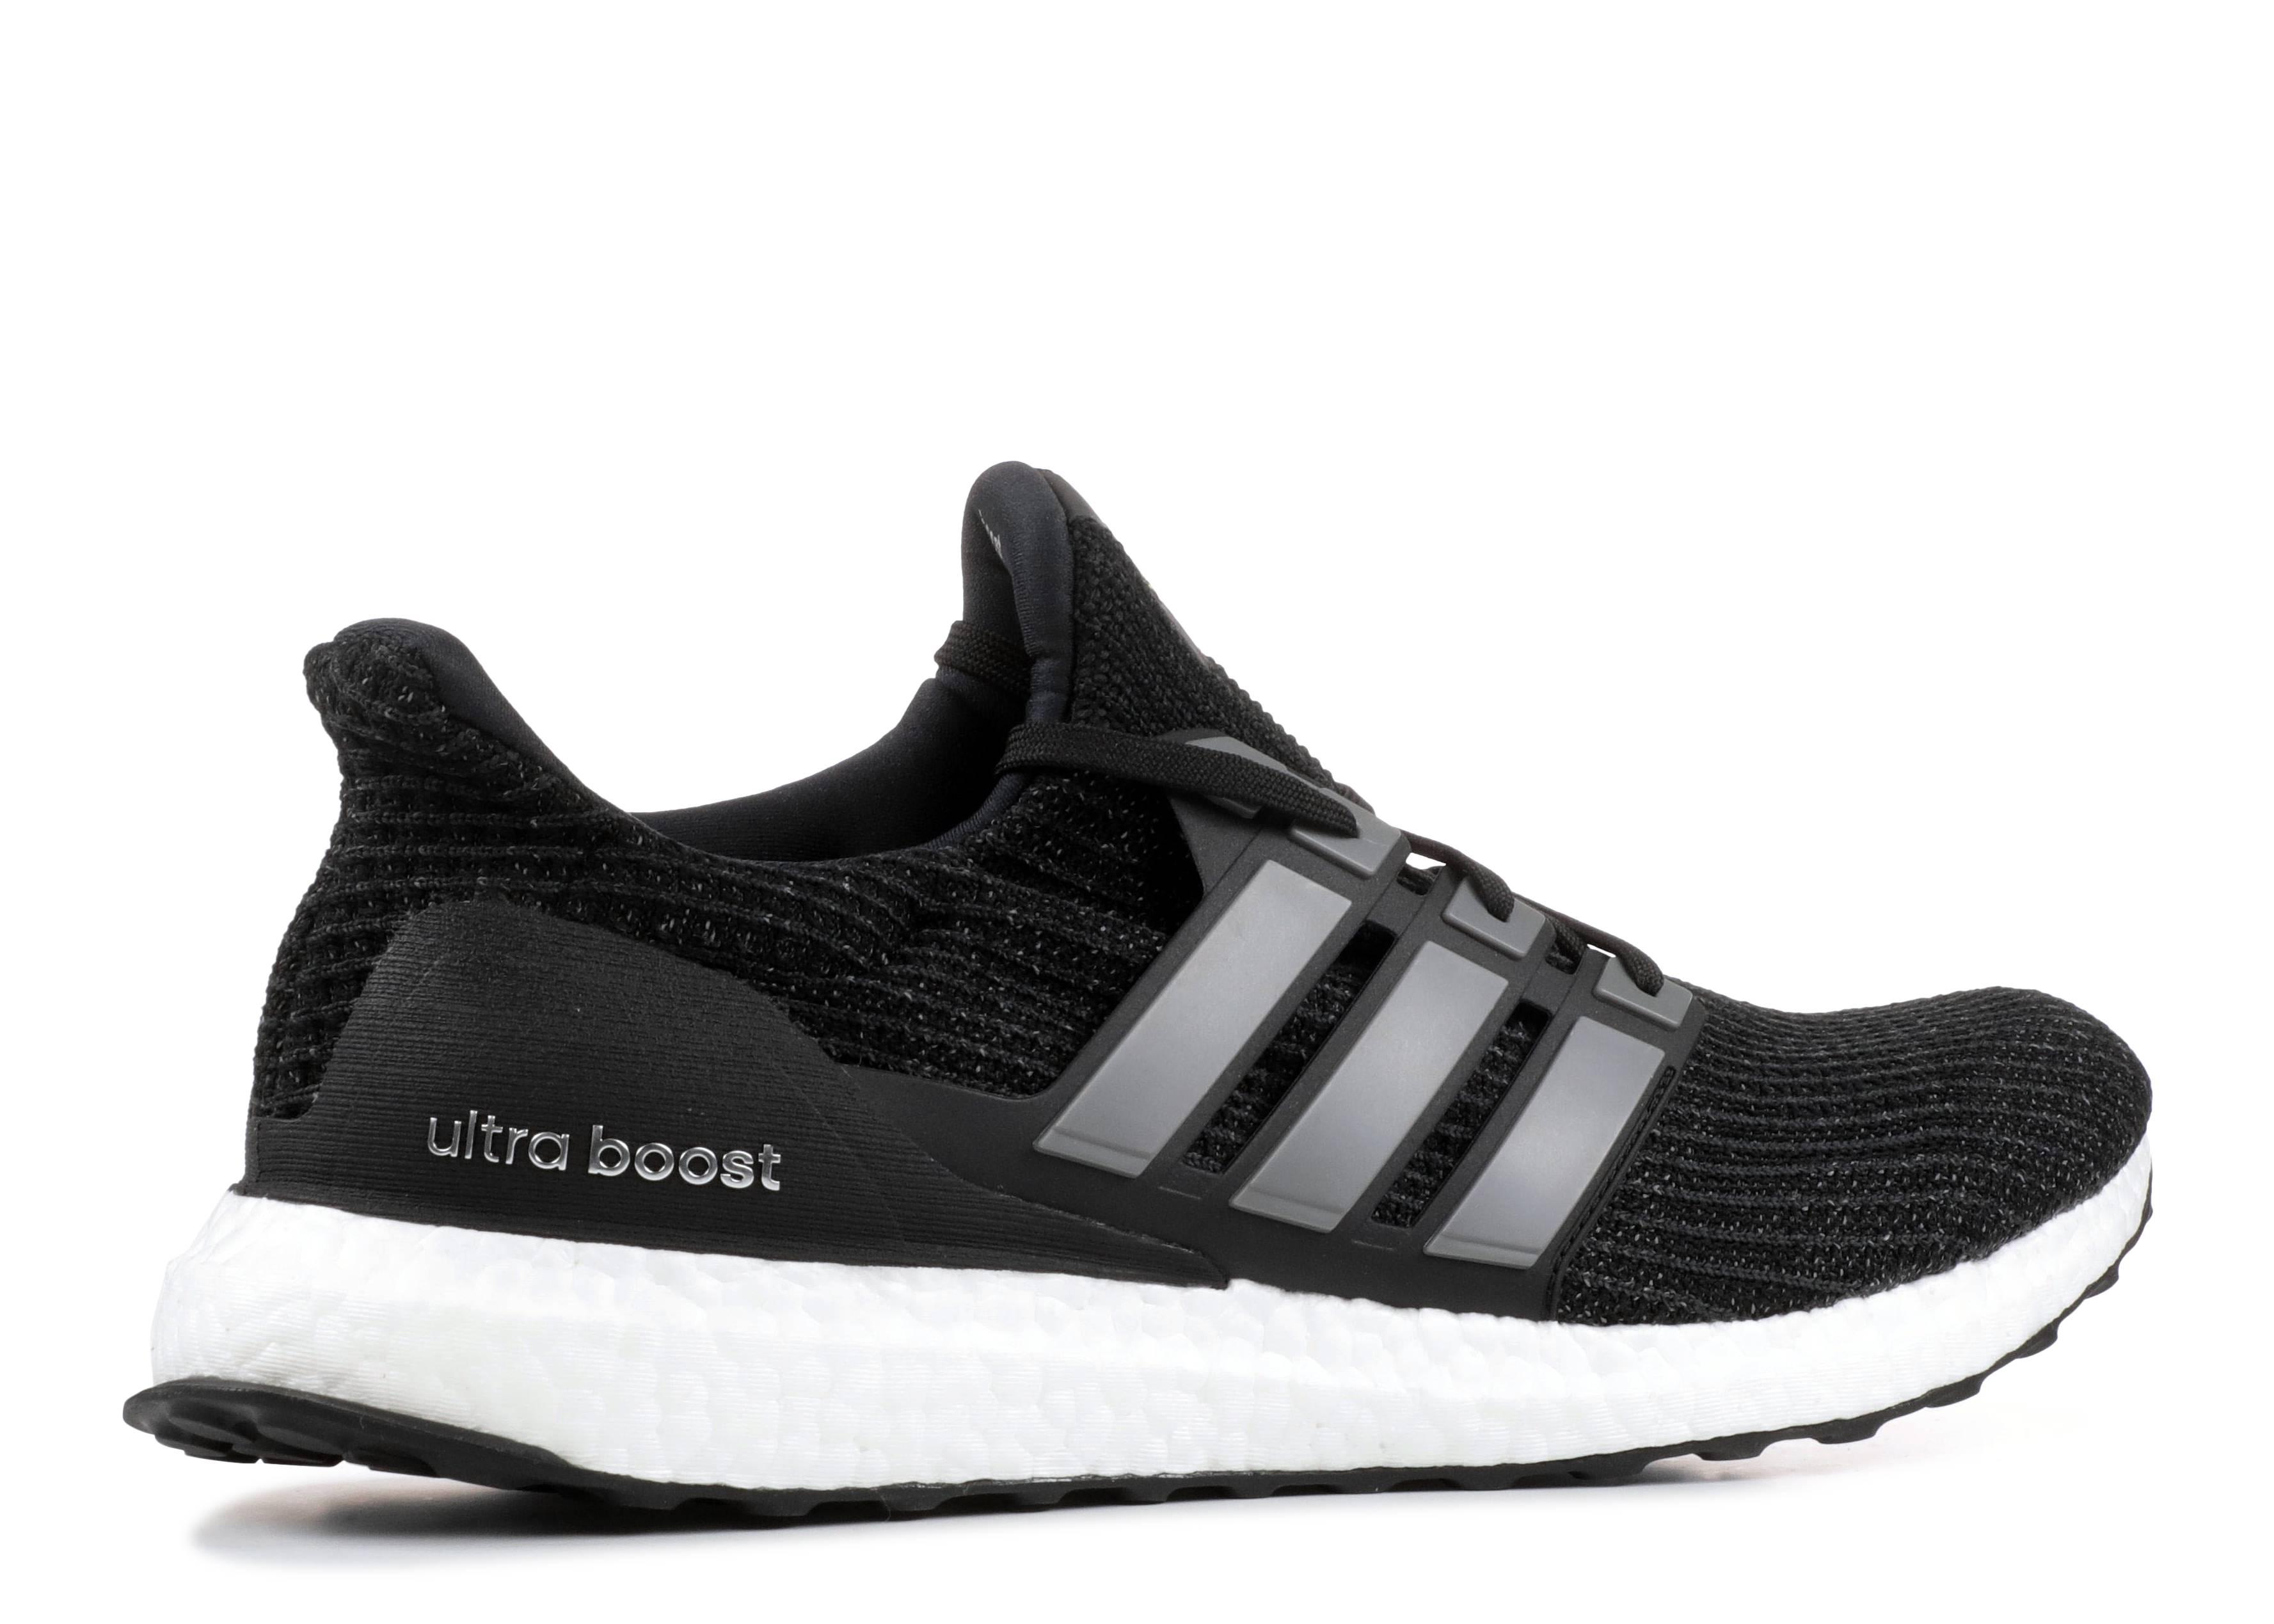 a5059fec35692 Adidas Ultra Boost 5th Anniversary Black - 3